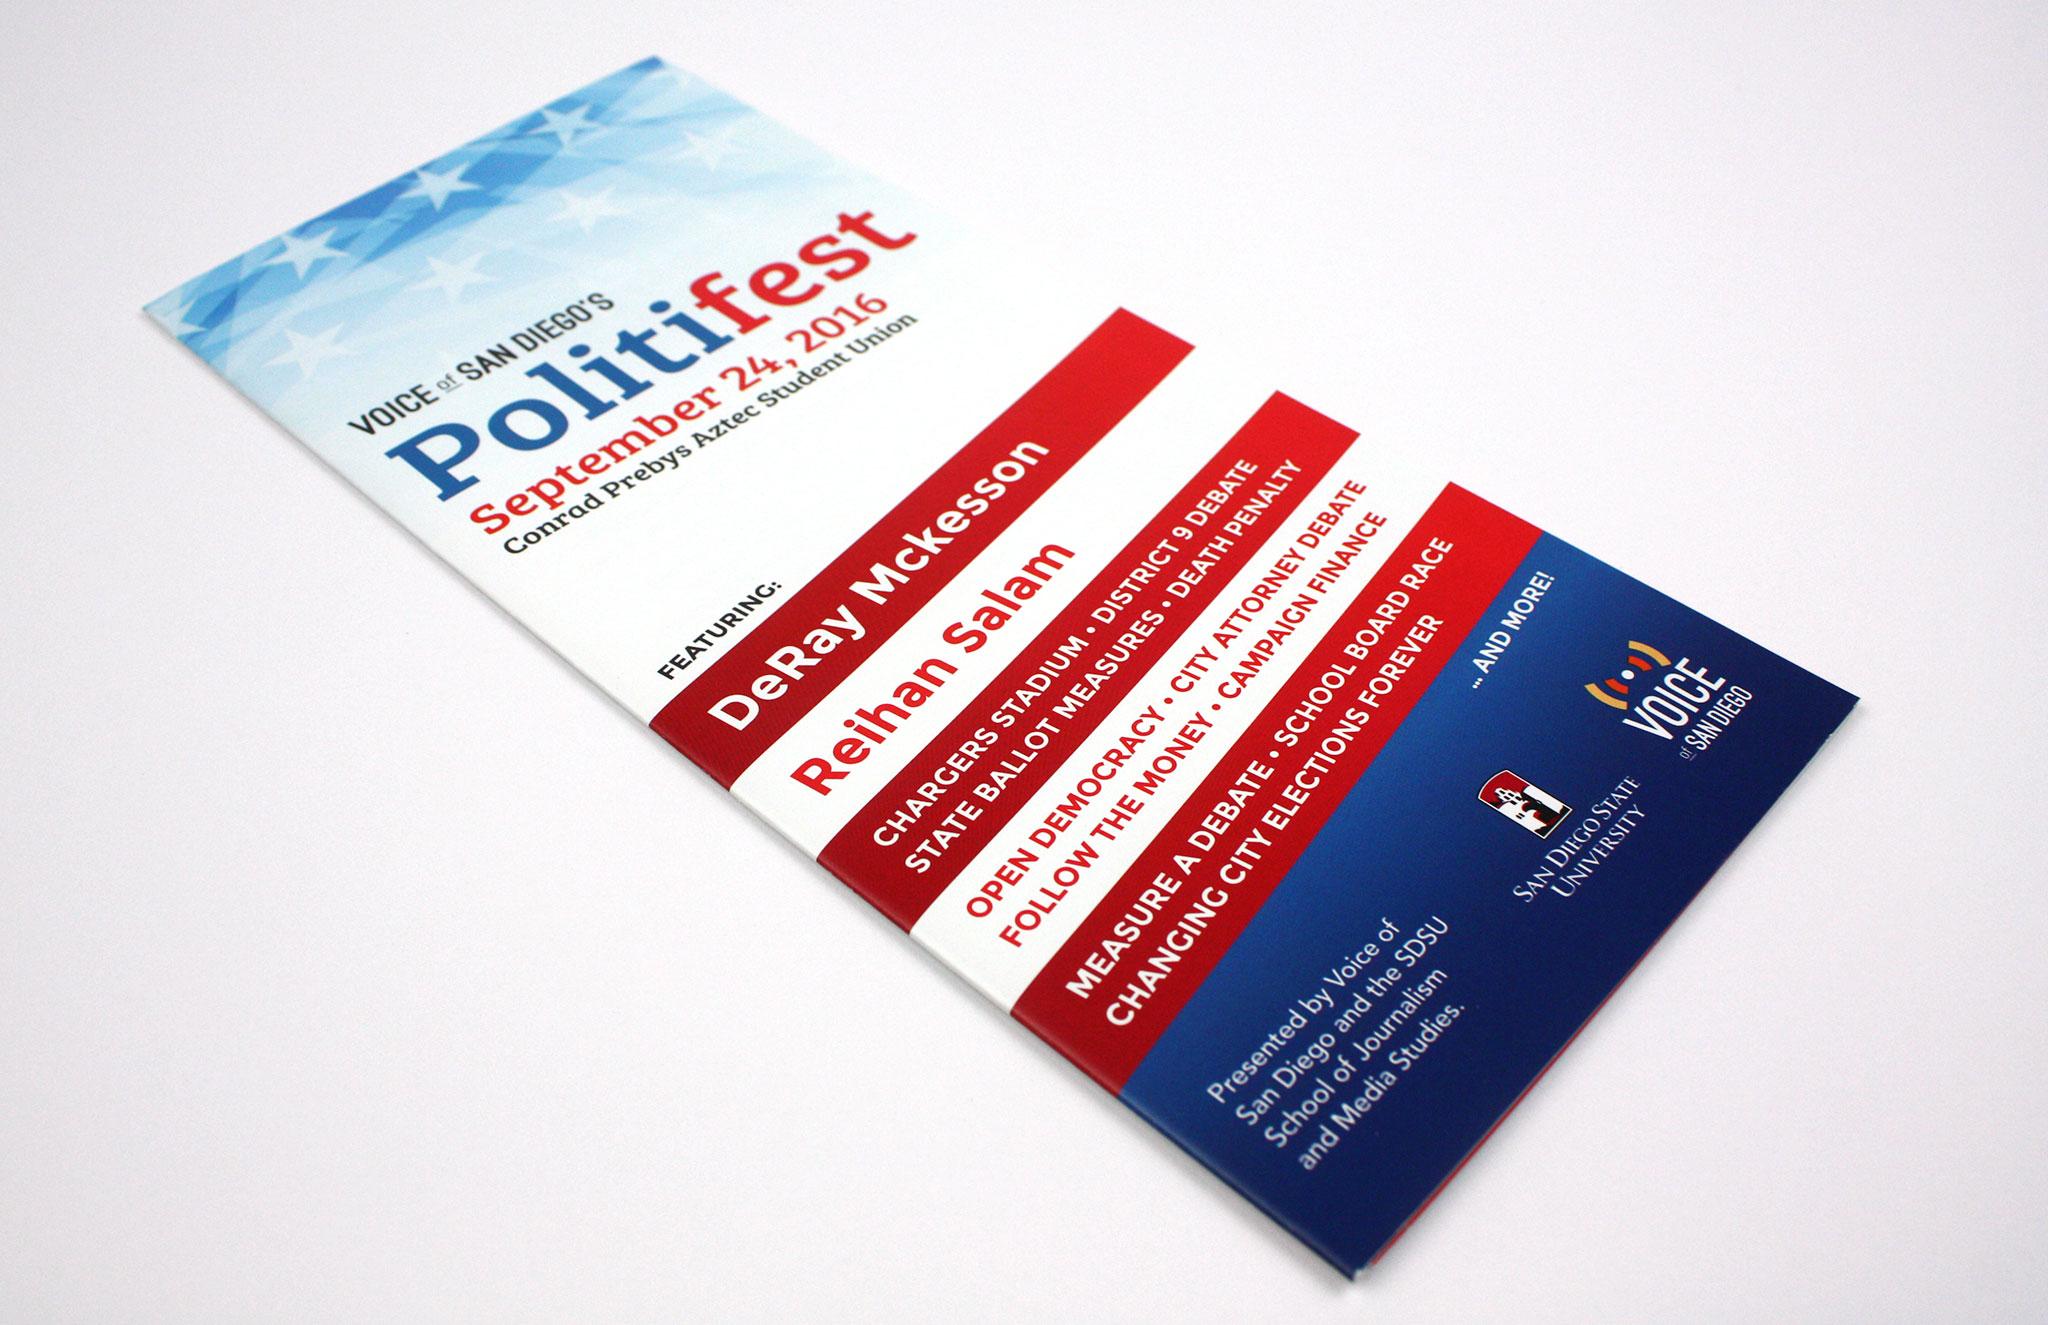 Politifest event program by Ashley Lewis